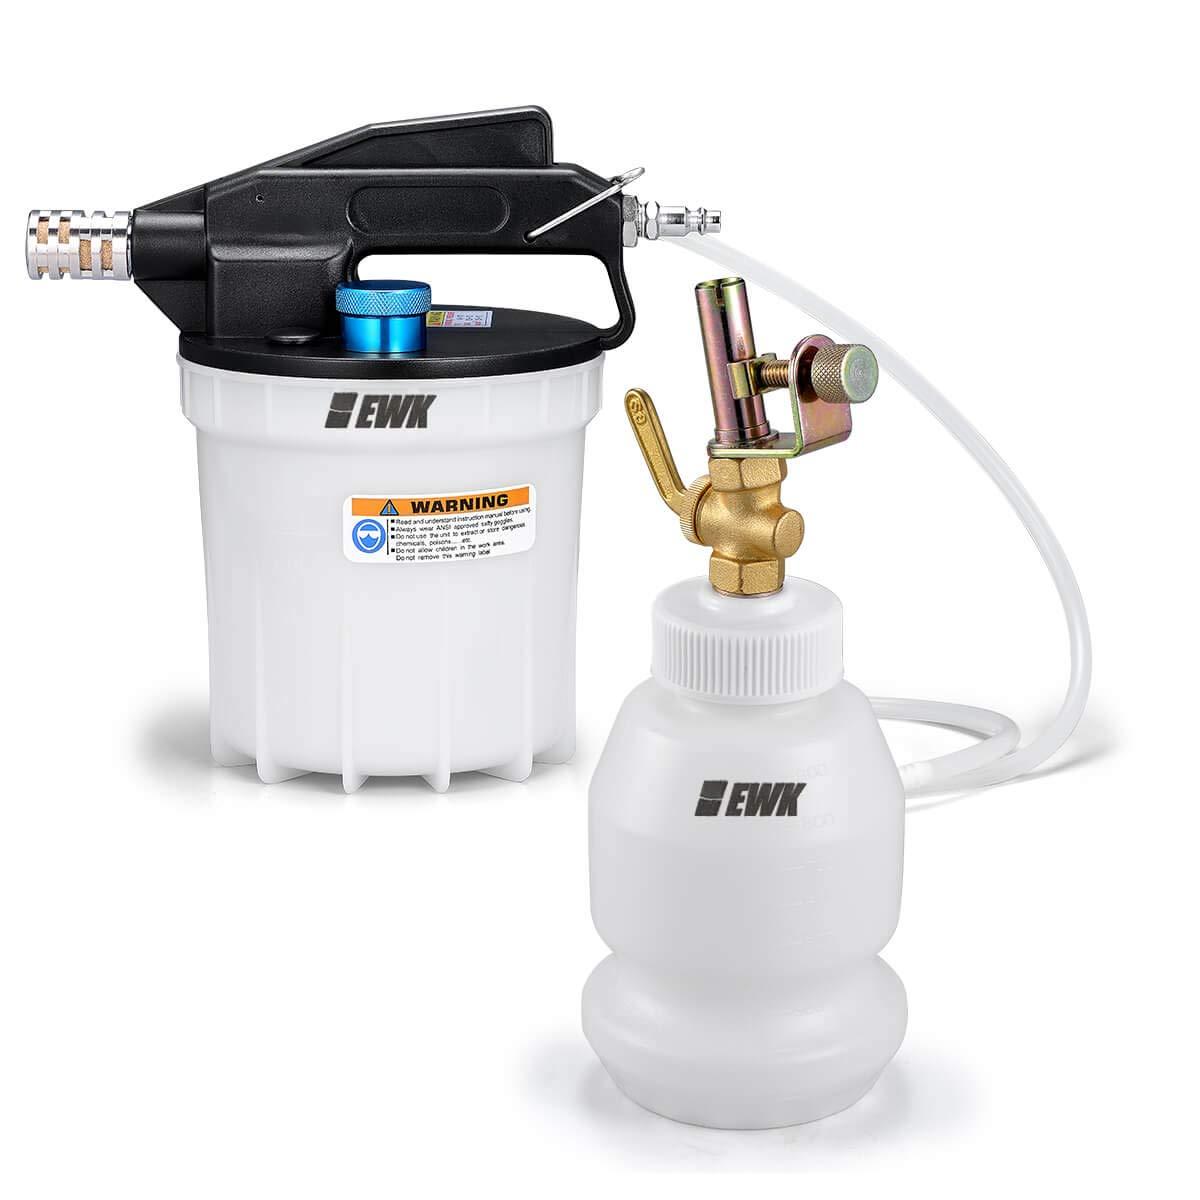 EWK 2L Pneumatic Air Vacuum Brake Fluid Bleeder Extractor Pump & 1L Auto-Refill Flush Filling Bottle